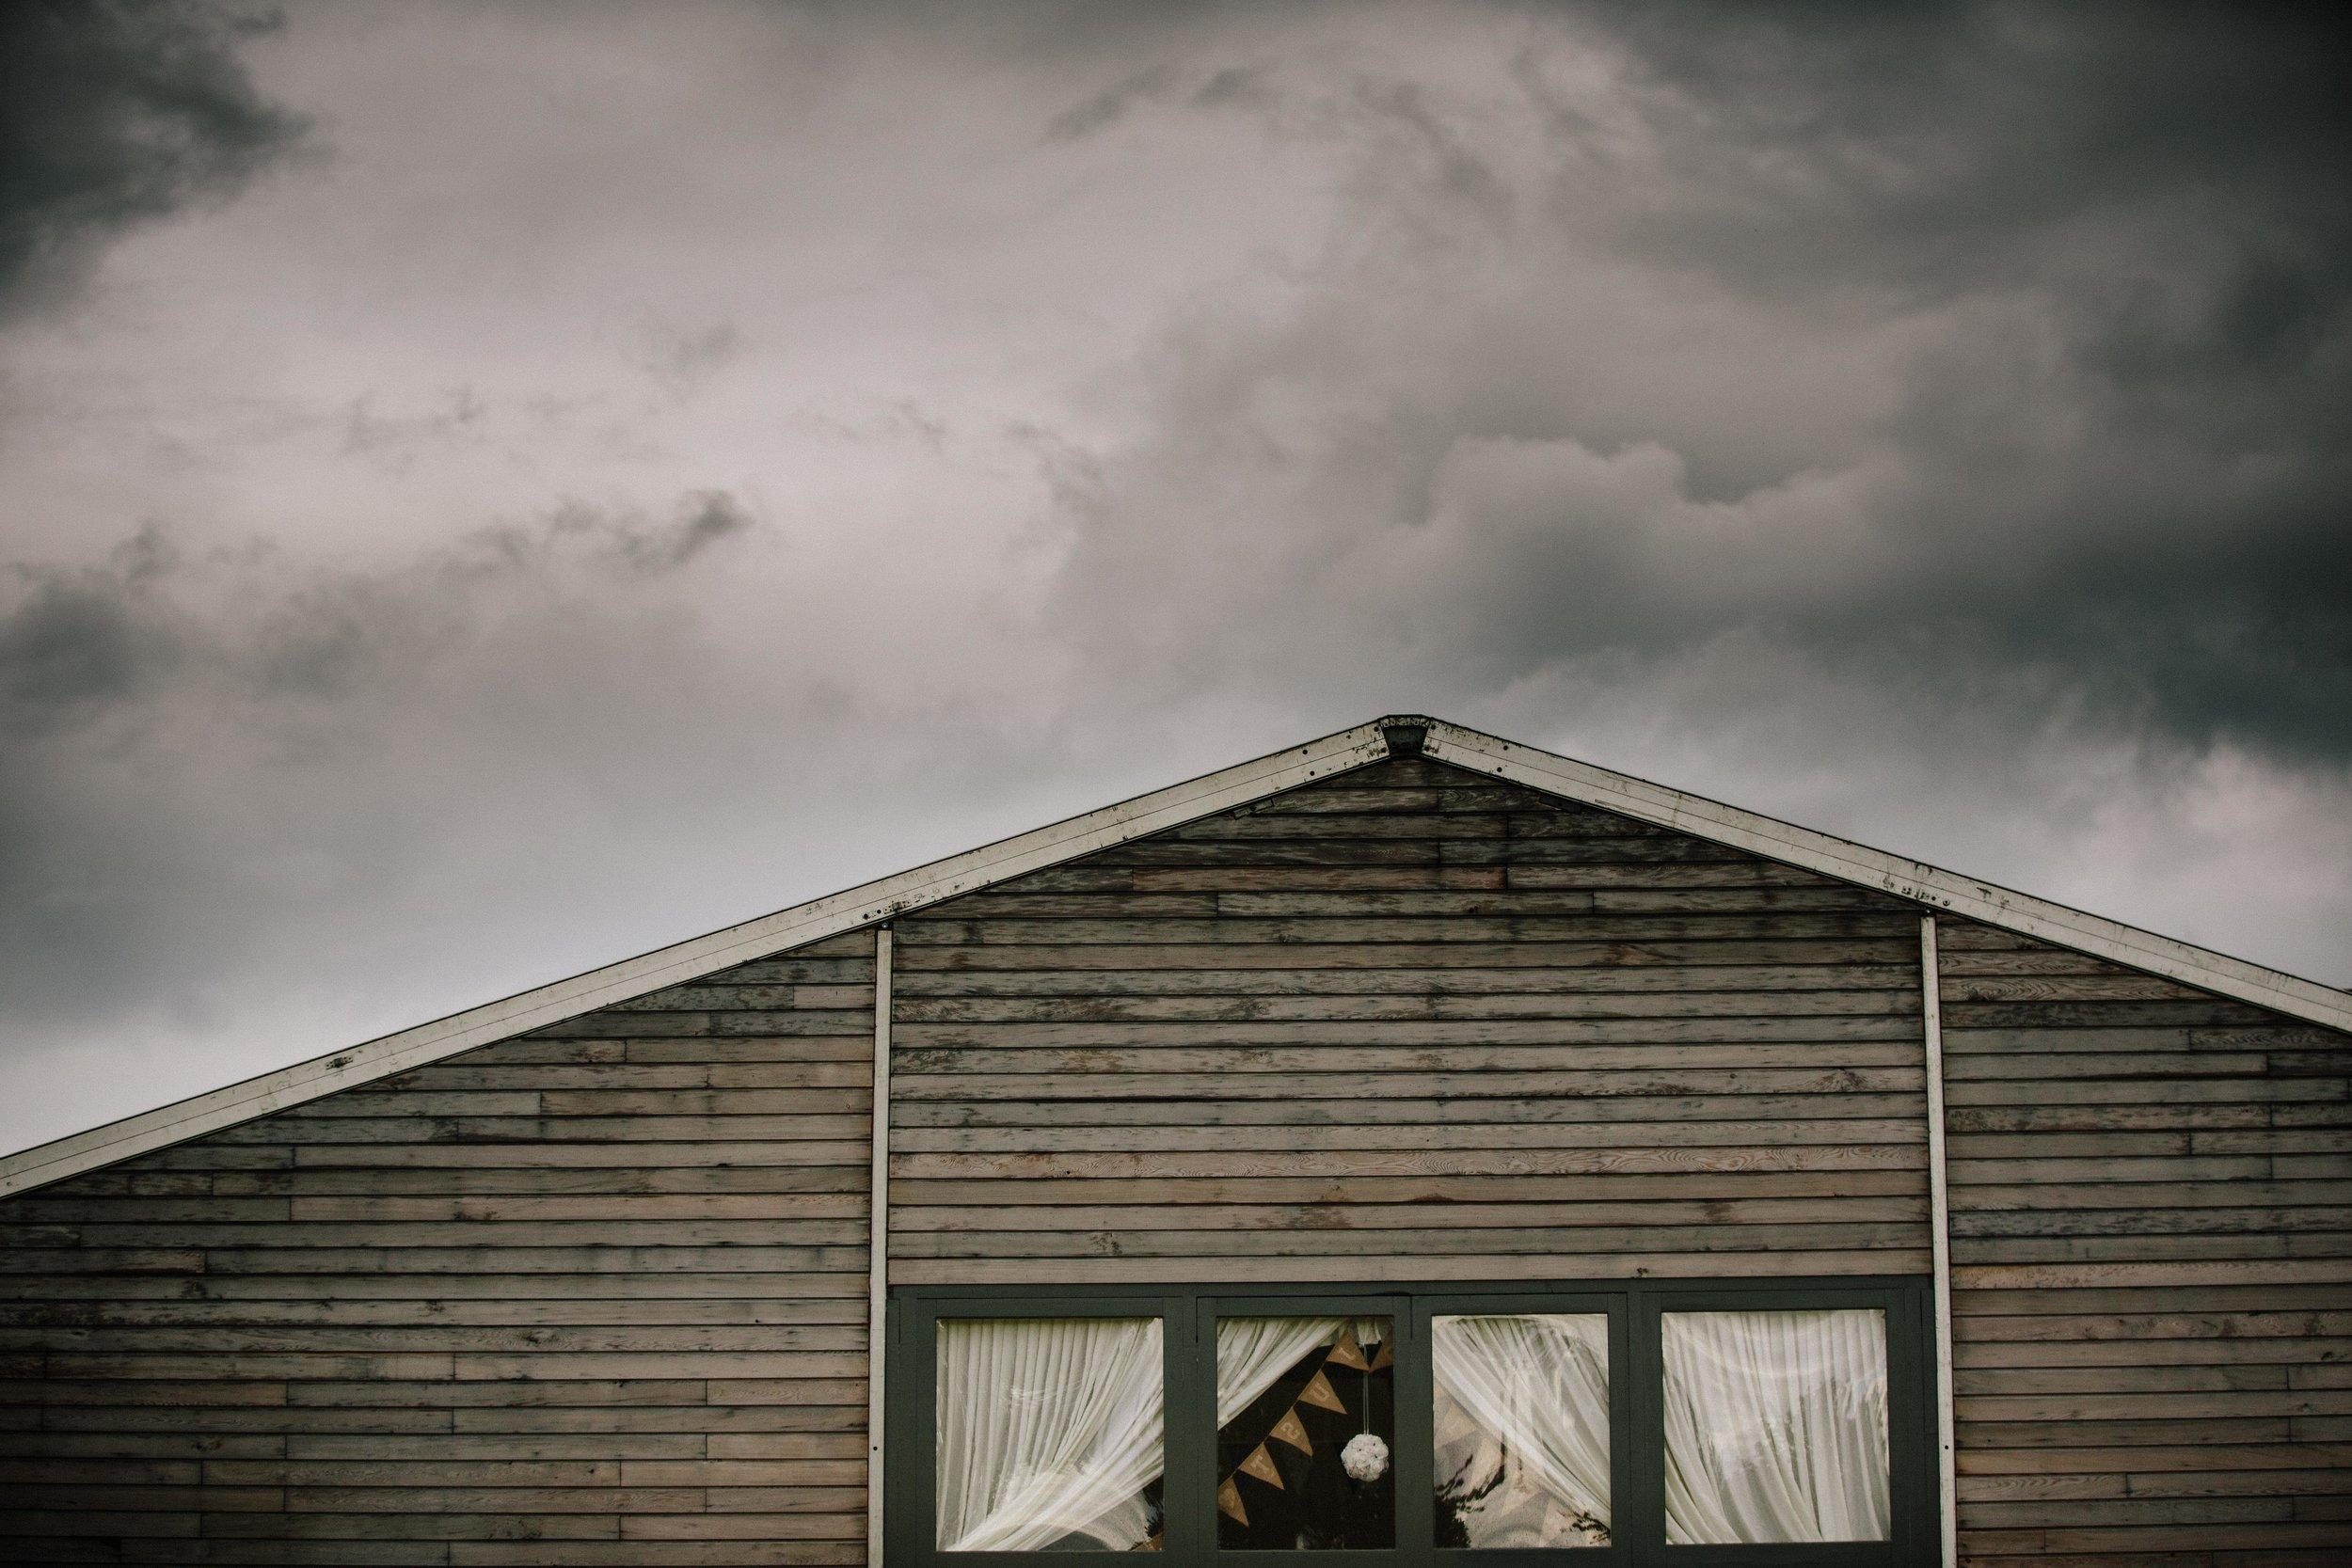 cotswalds-chipping-norton-oxfordshire-london-wedding-photography-spa-hotel-56